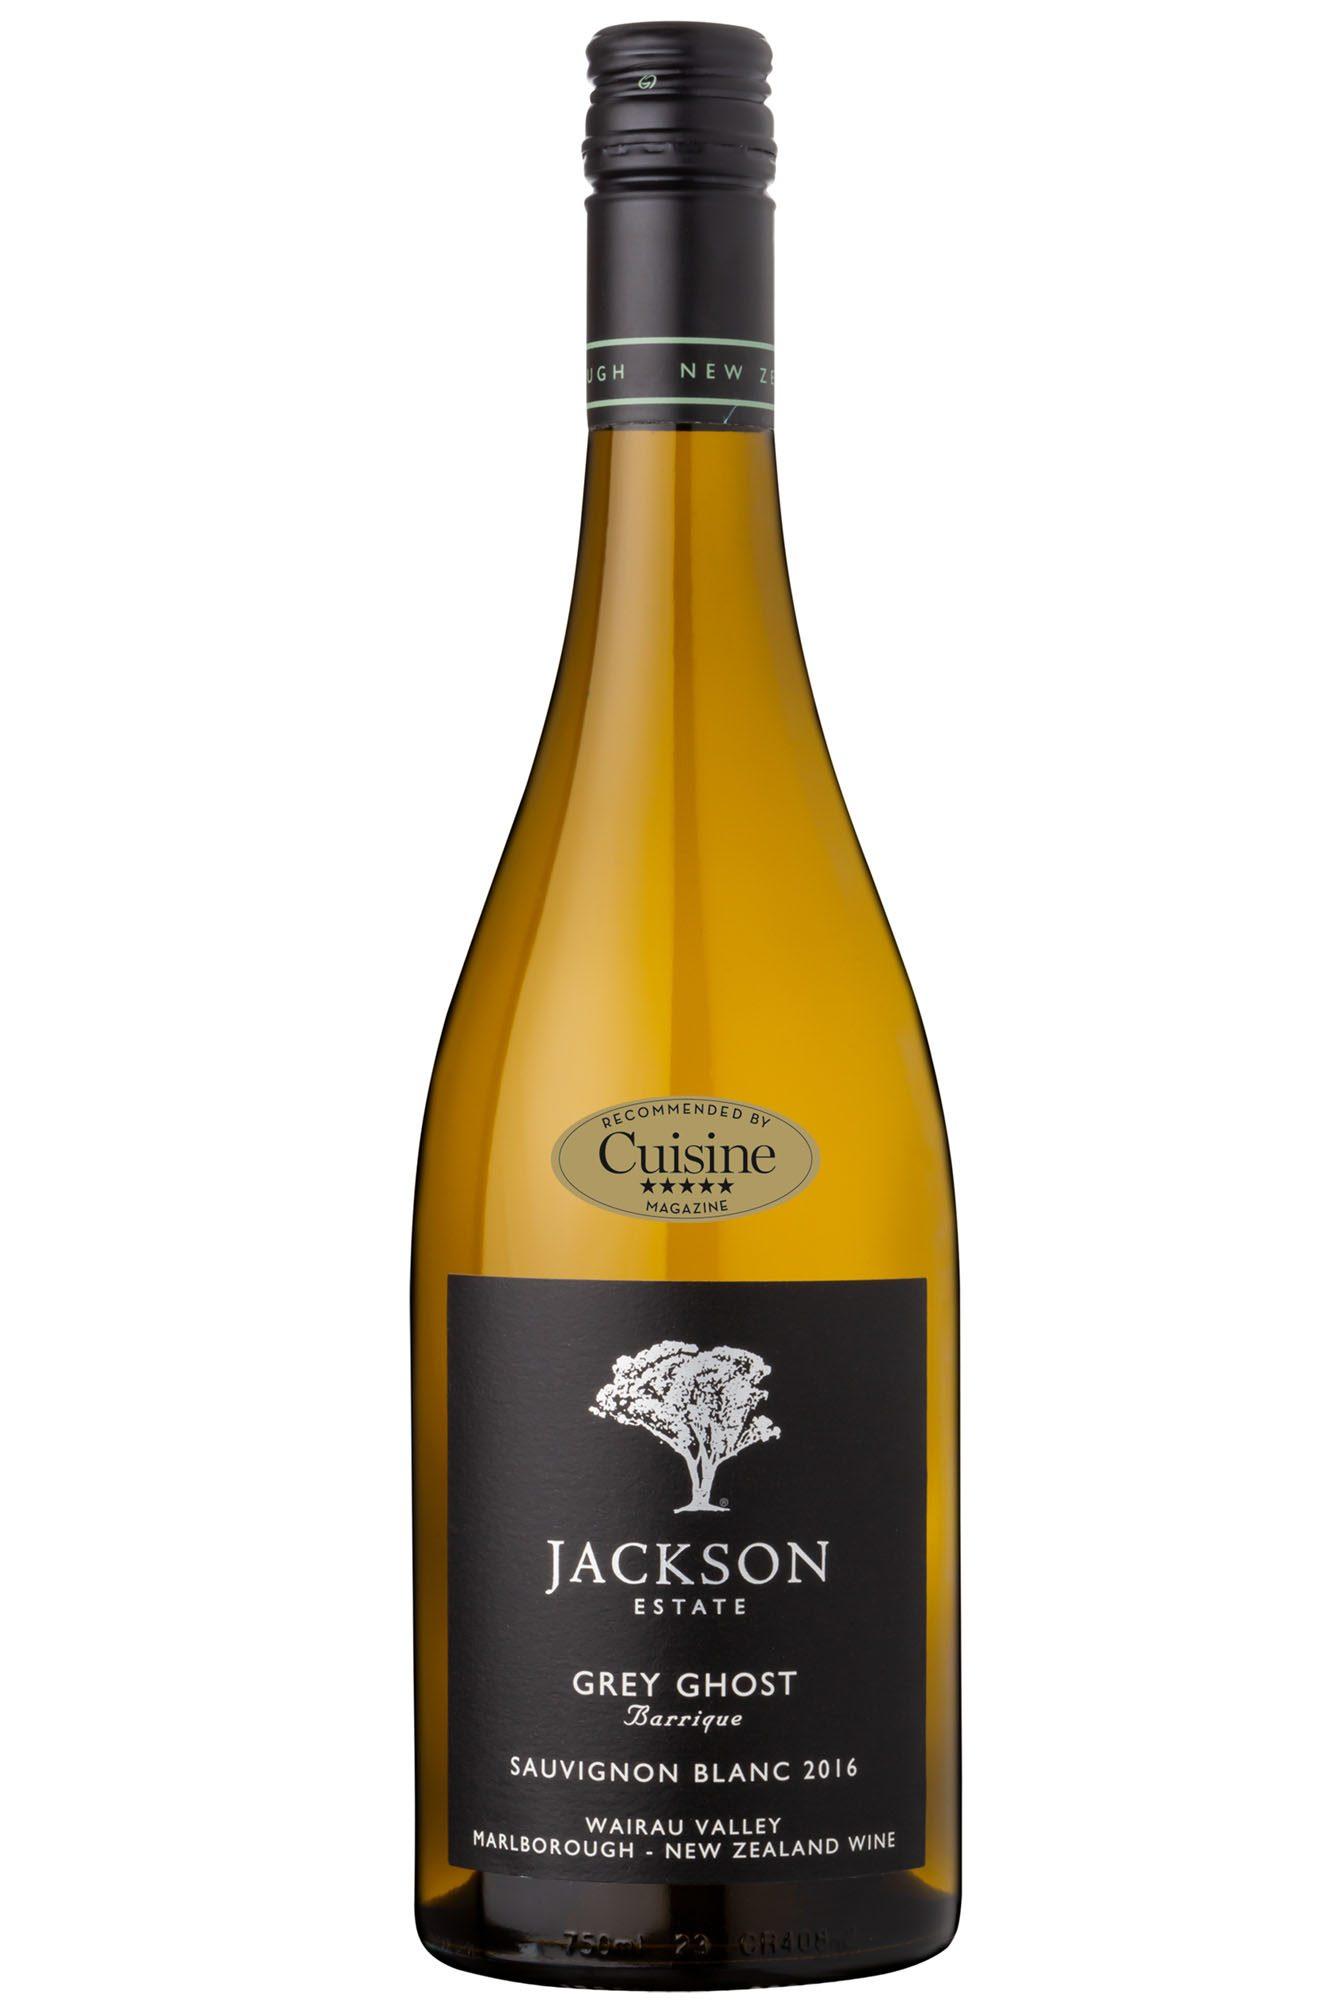 Jackson Estate Grey Ghost Barrique Sauvignon Blanc 2016 (Marlborough